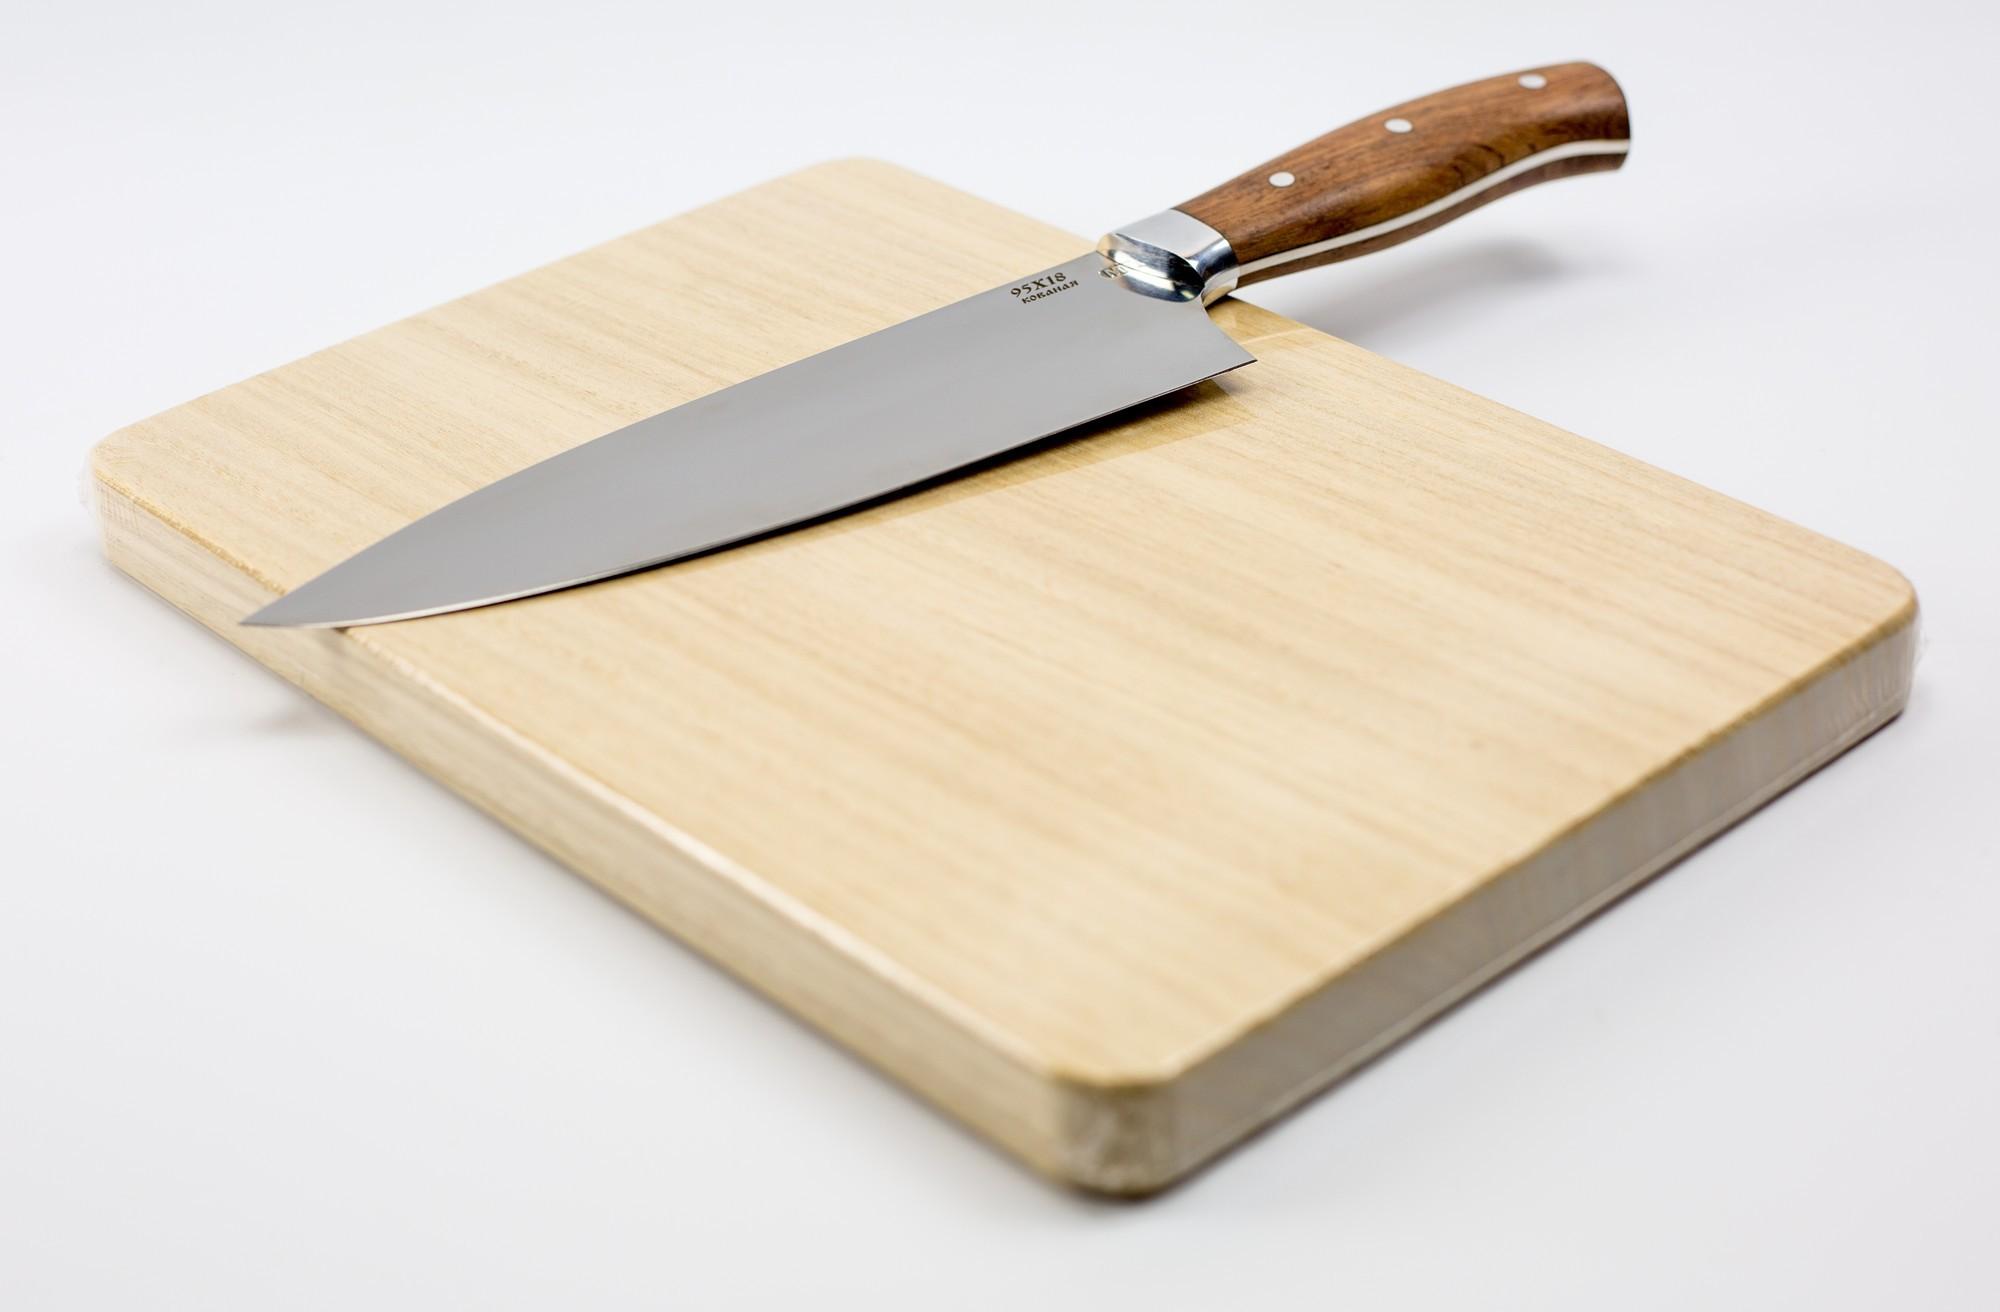 Фото 4 - Доска разделочная (Table size) , 270*190*20мм, Hatamoto